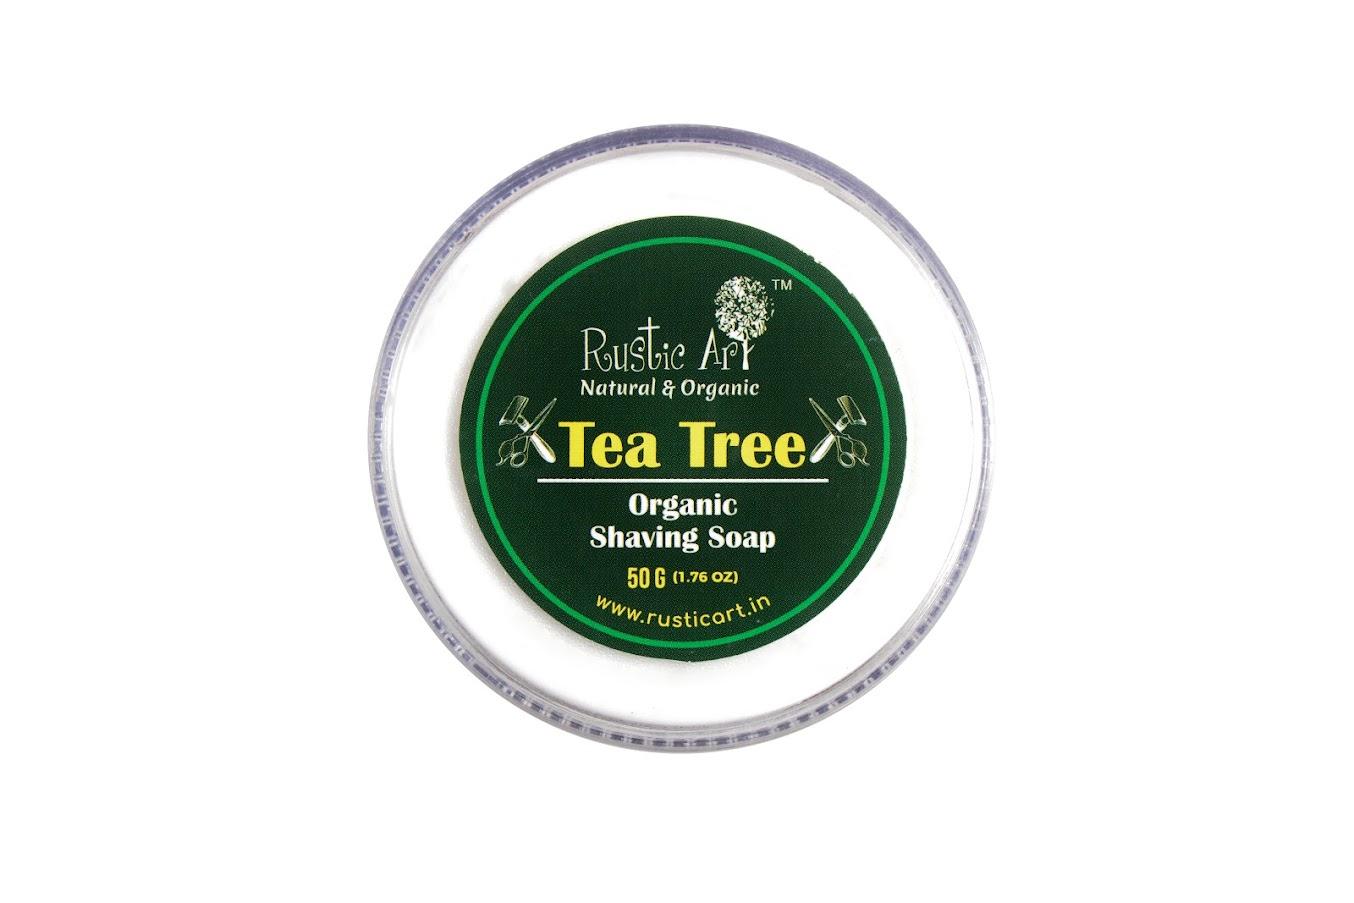 Rustic Art Tea Tree Shaving Soap